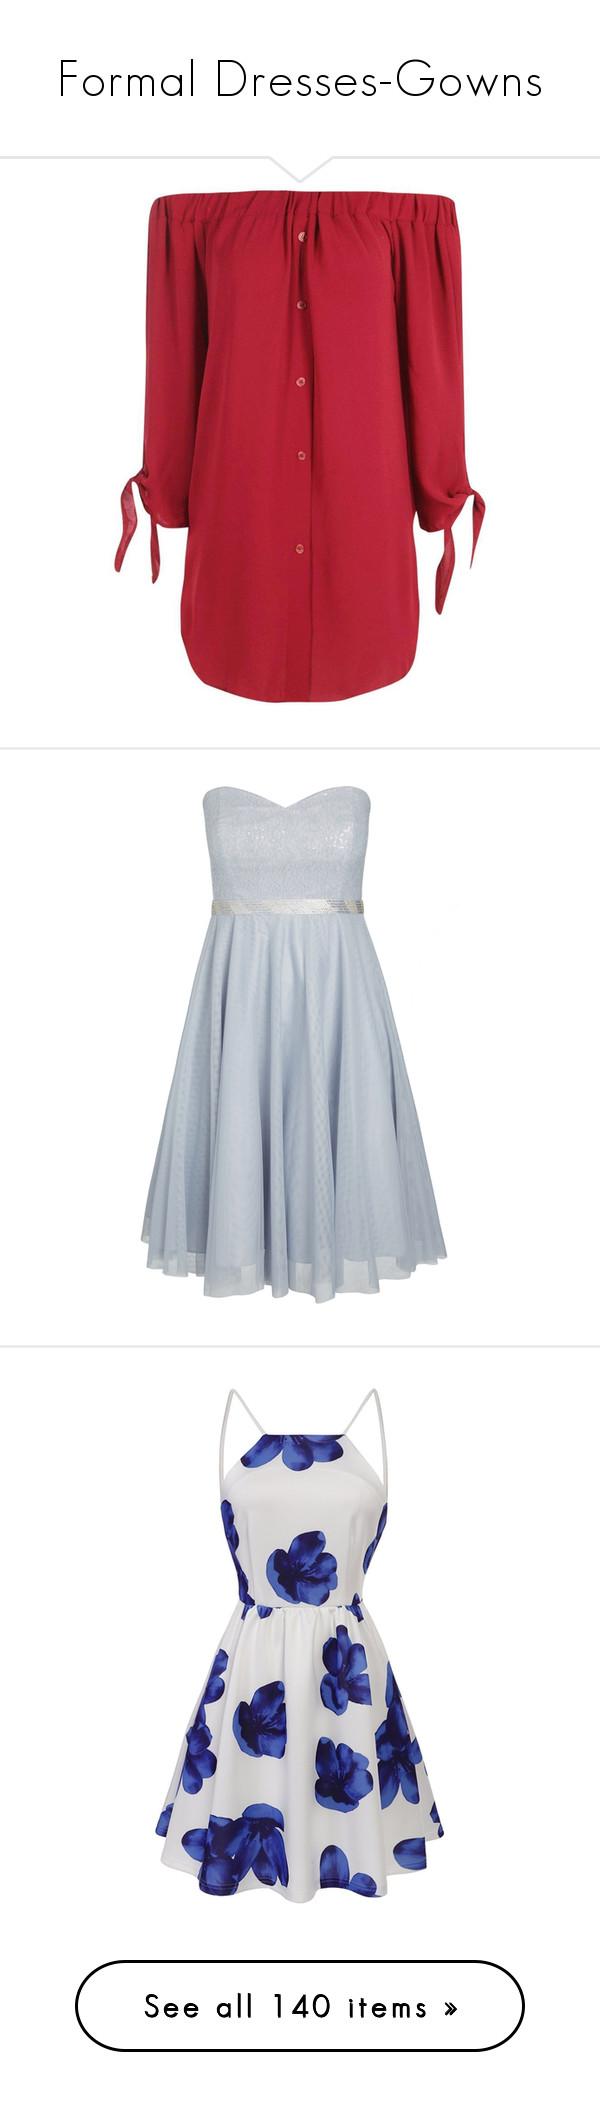 Formal dressesgowns